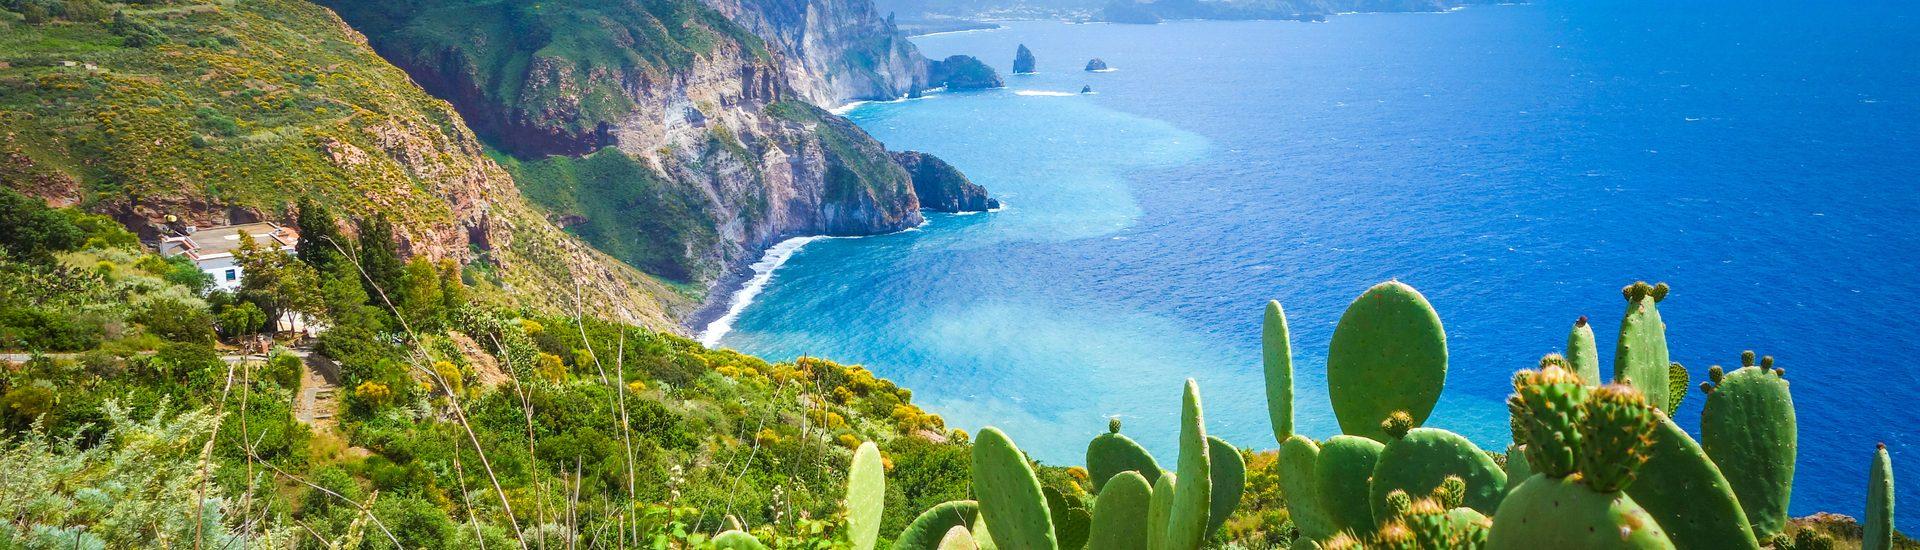 Lipari - Isole Eolie